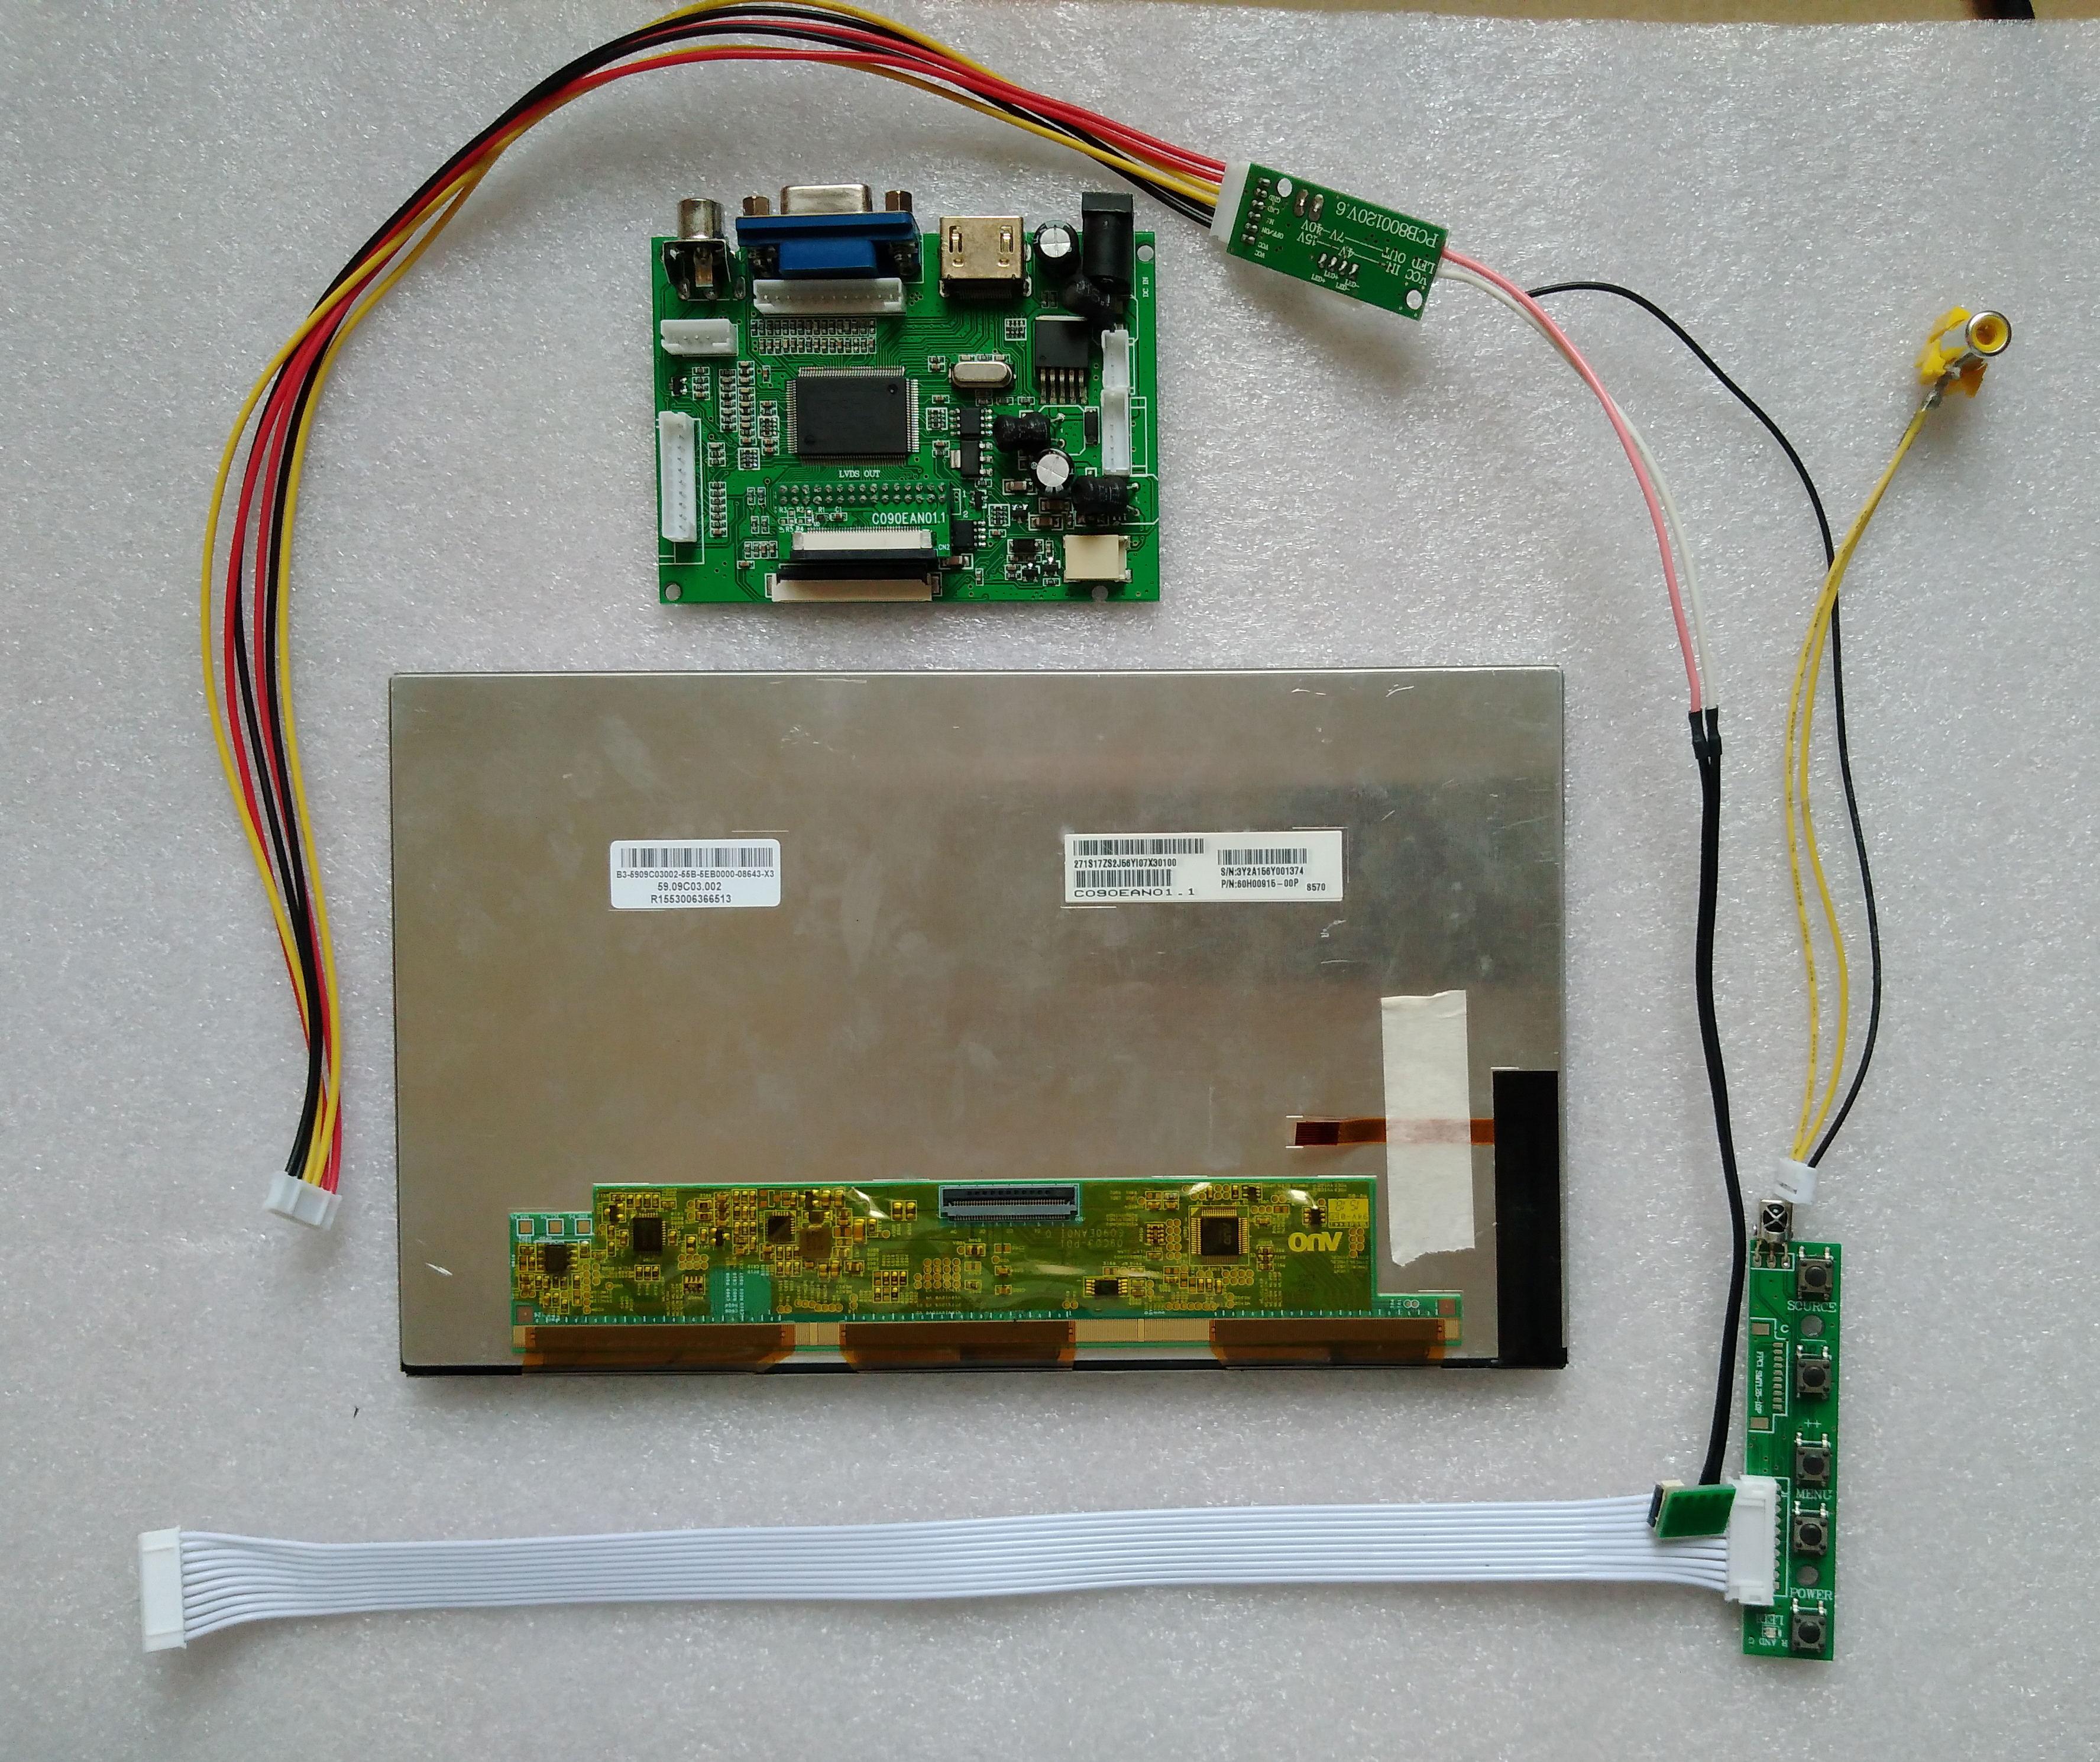 9 10.1 10.2 Inch Carpc DIY 1366*768 IPS HDMI Display 1280*720 High Brightness USB Digitizer Touch Support Raspberry Pi WIN10